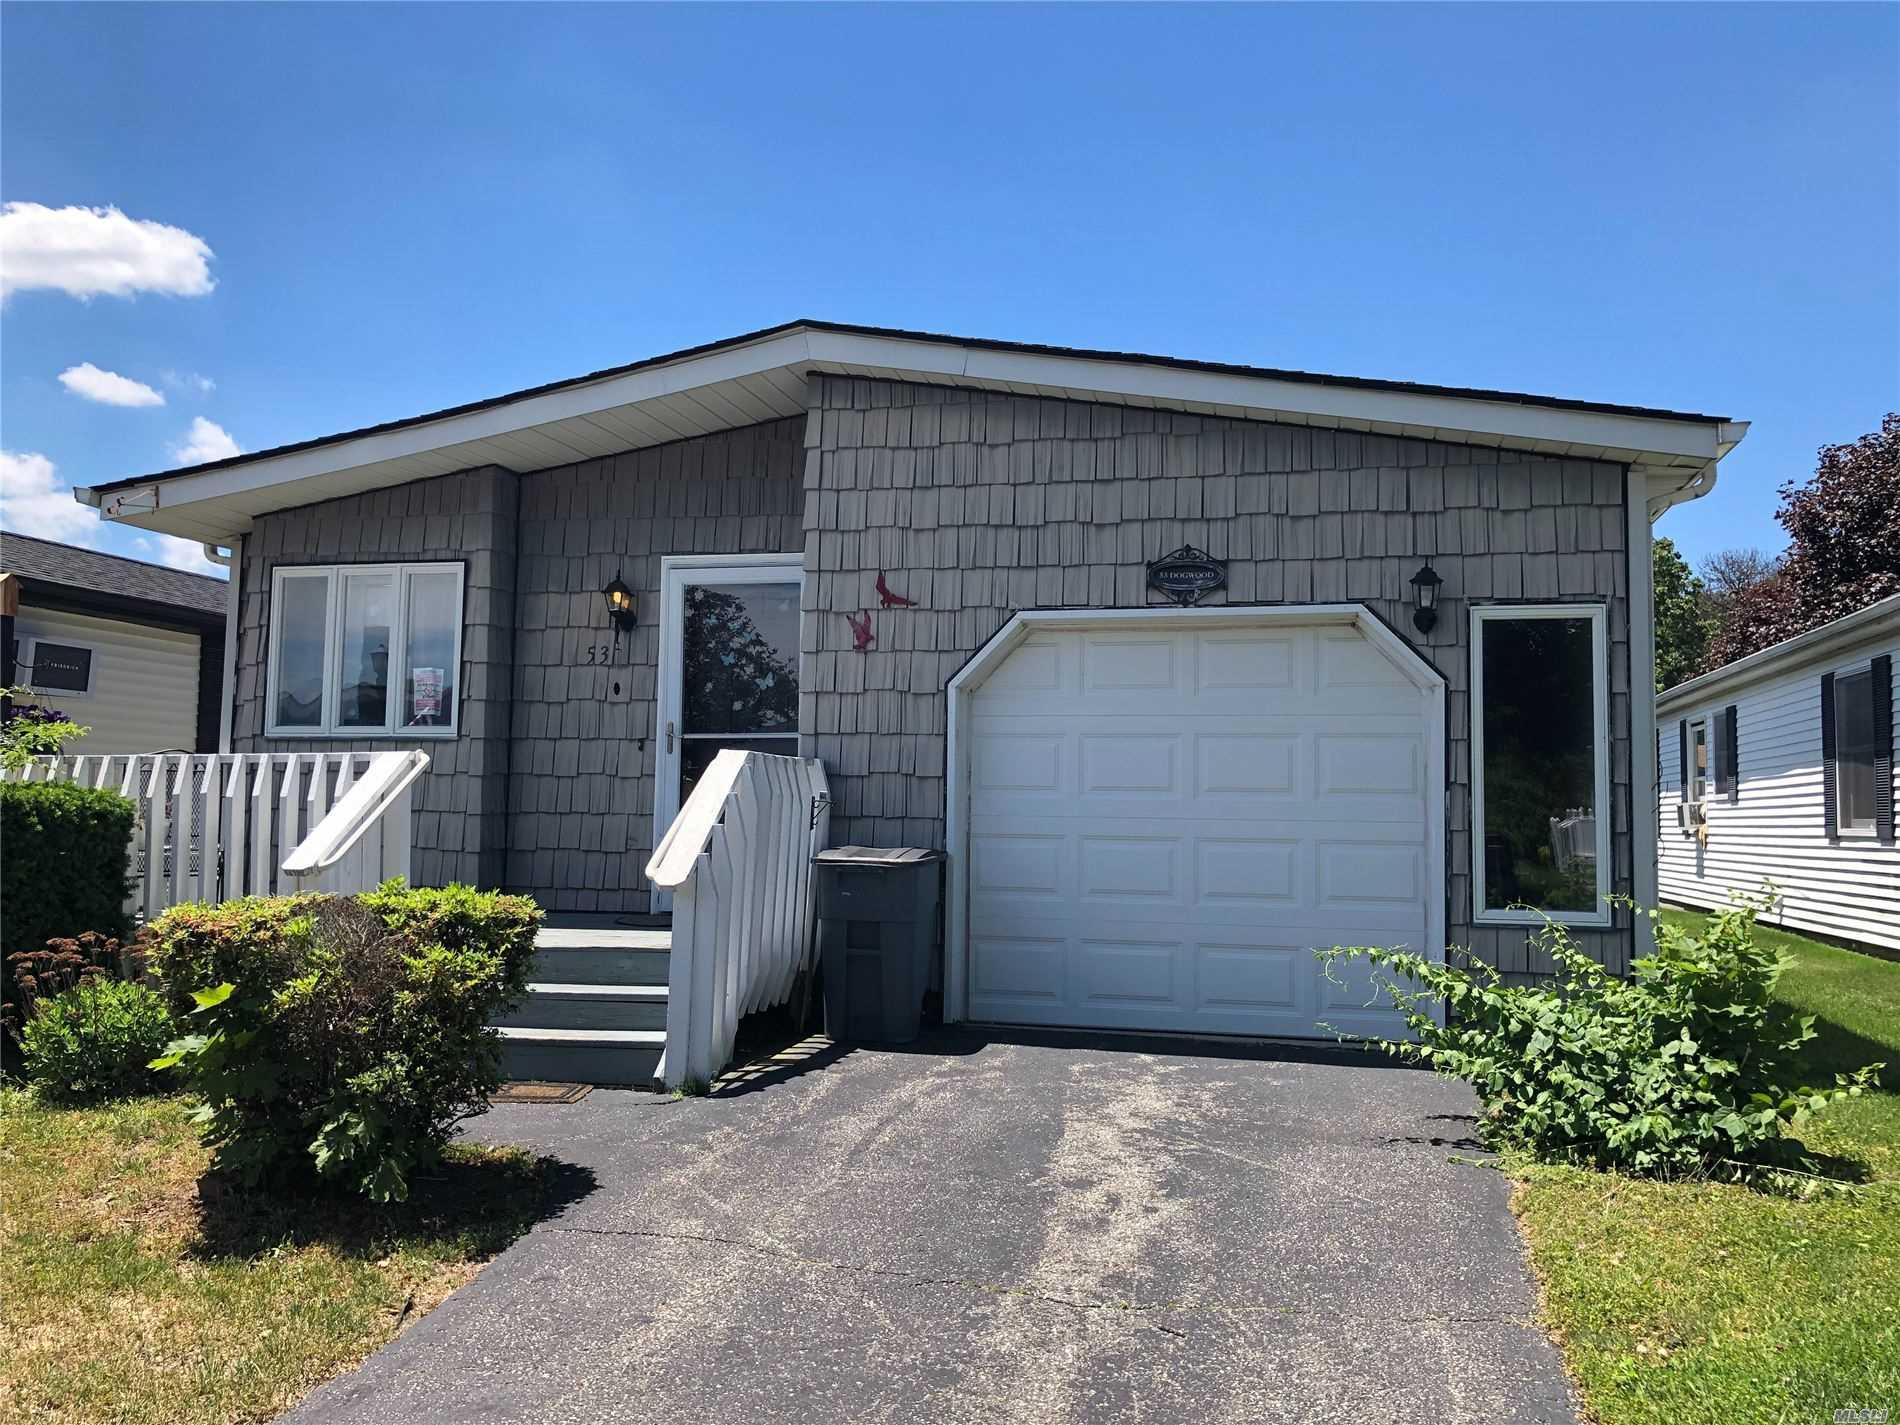 Property for sale at 53 Dogwood Lane, Manorville NY 11949, Manorville,  New York 11949